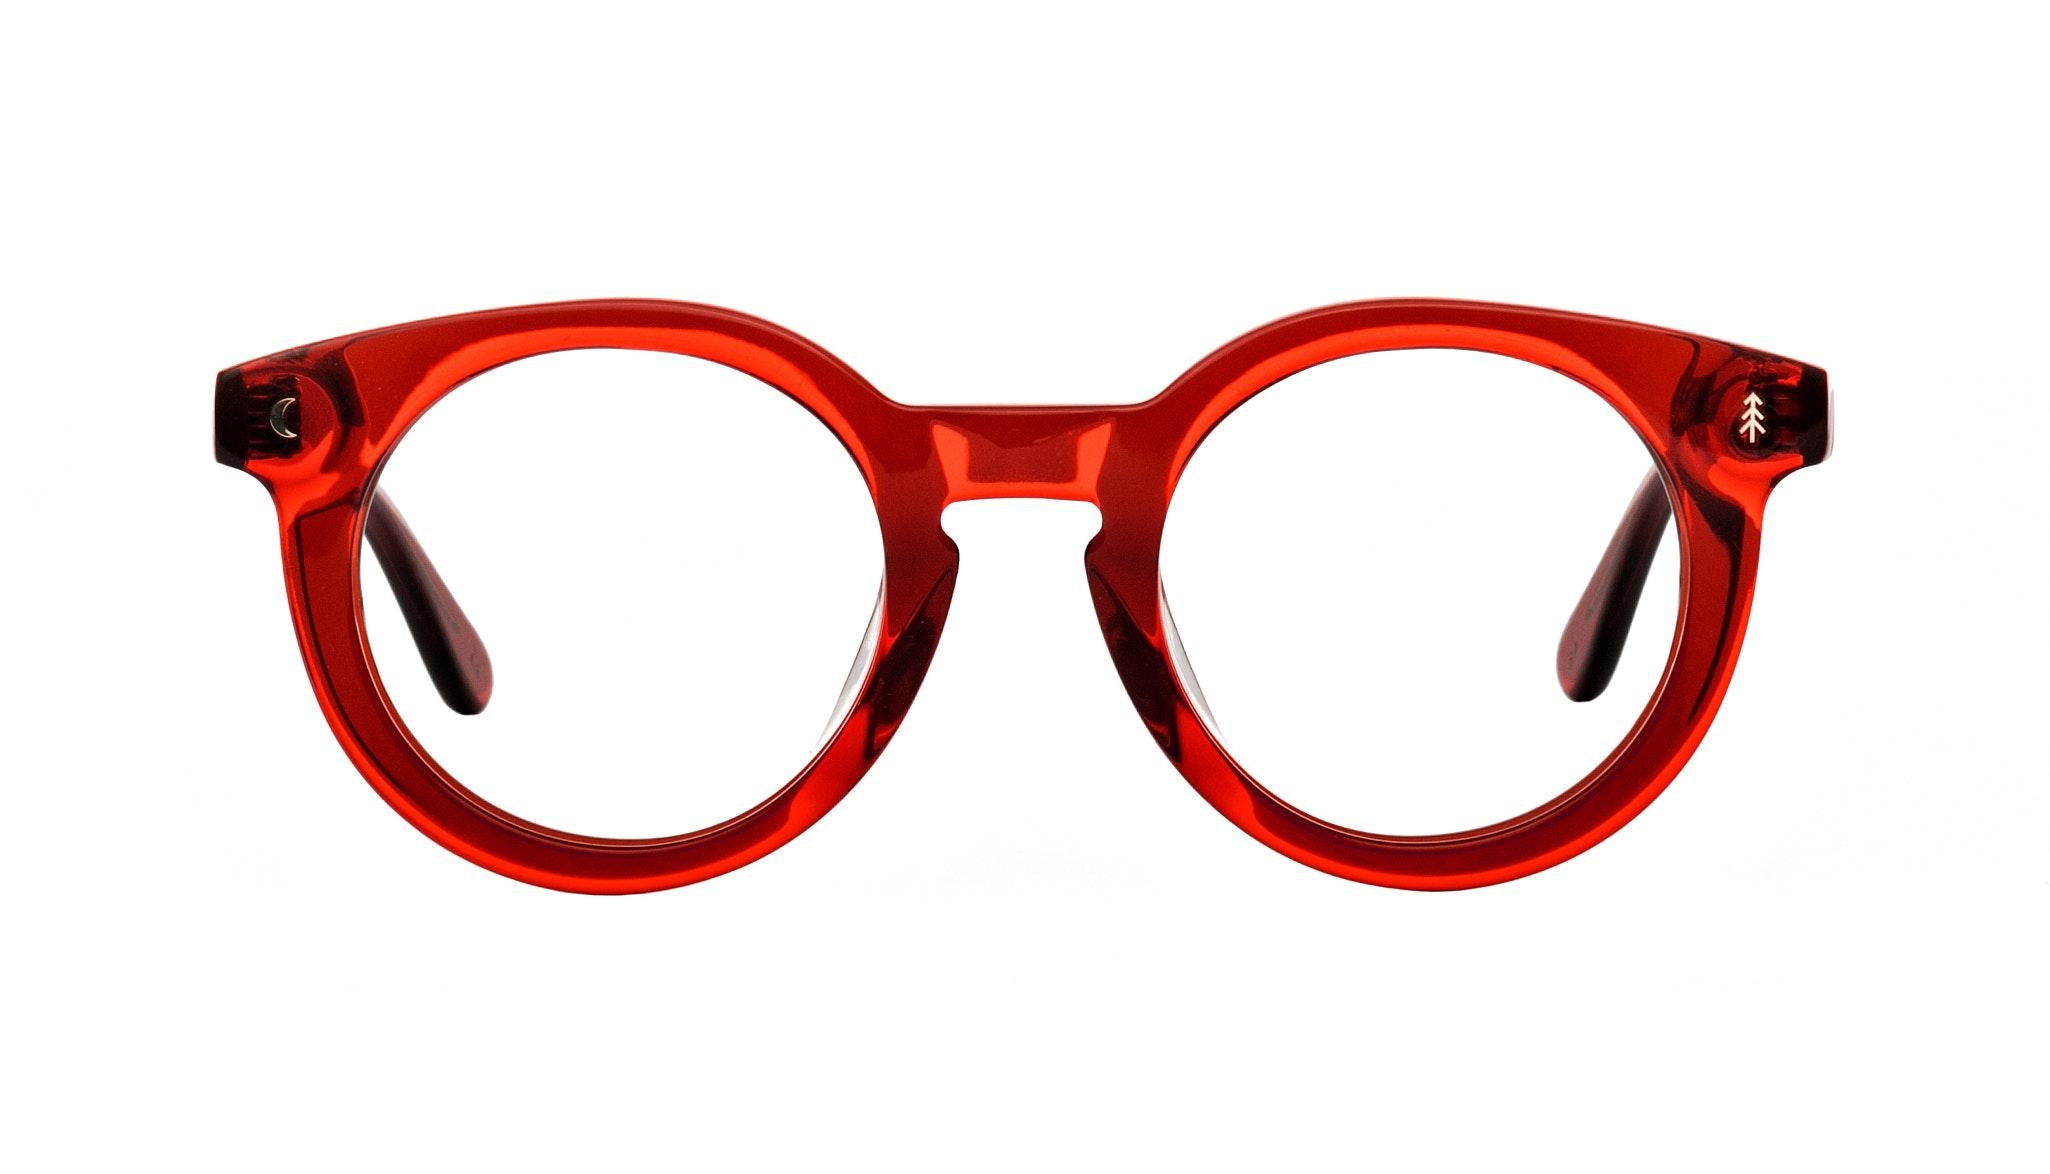 Affordable Fashion Glasses Round Eyeglasses Women Trailblazer Kindled Red Front